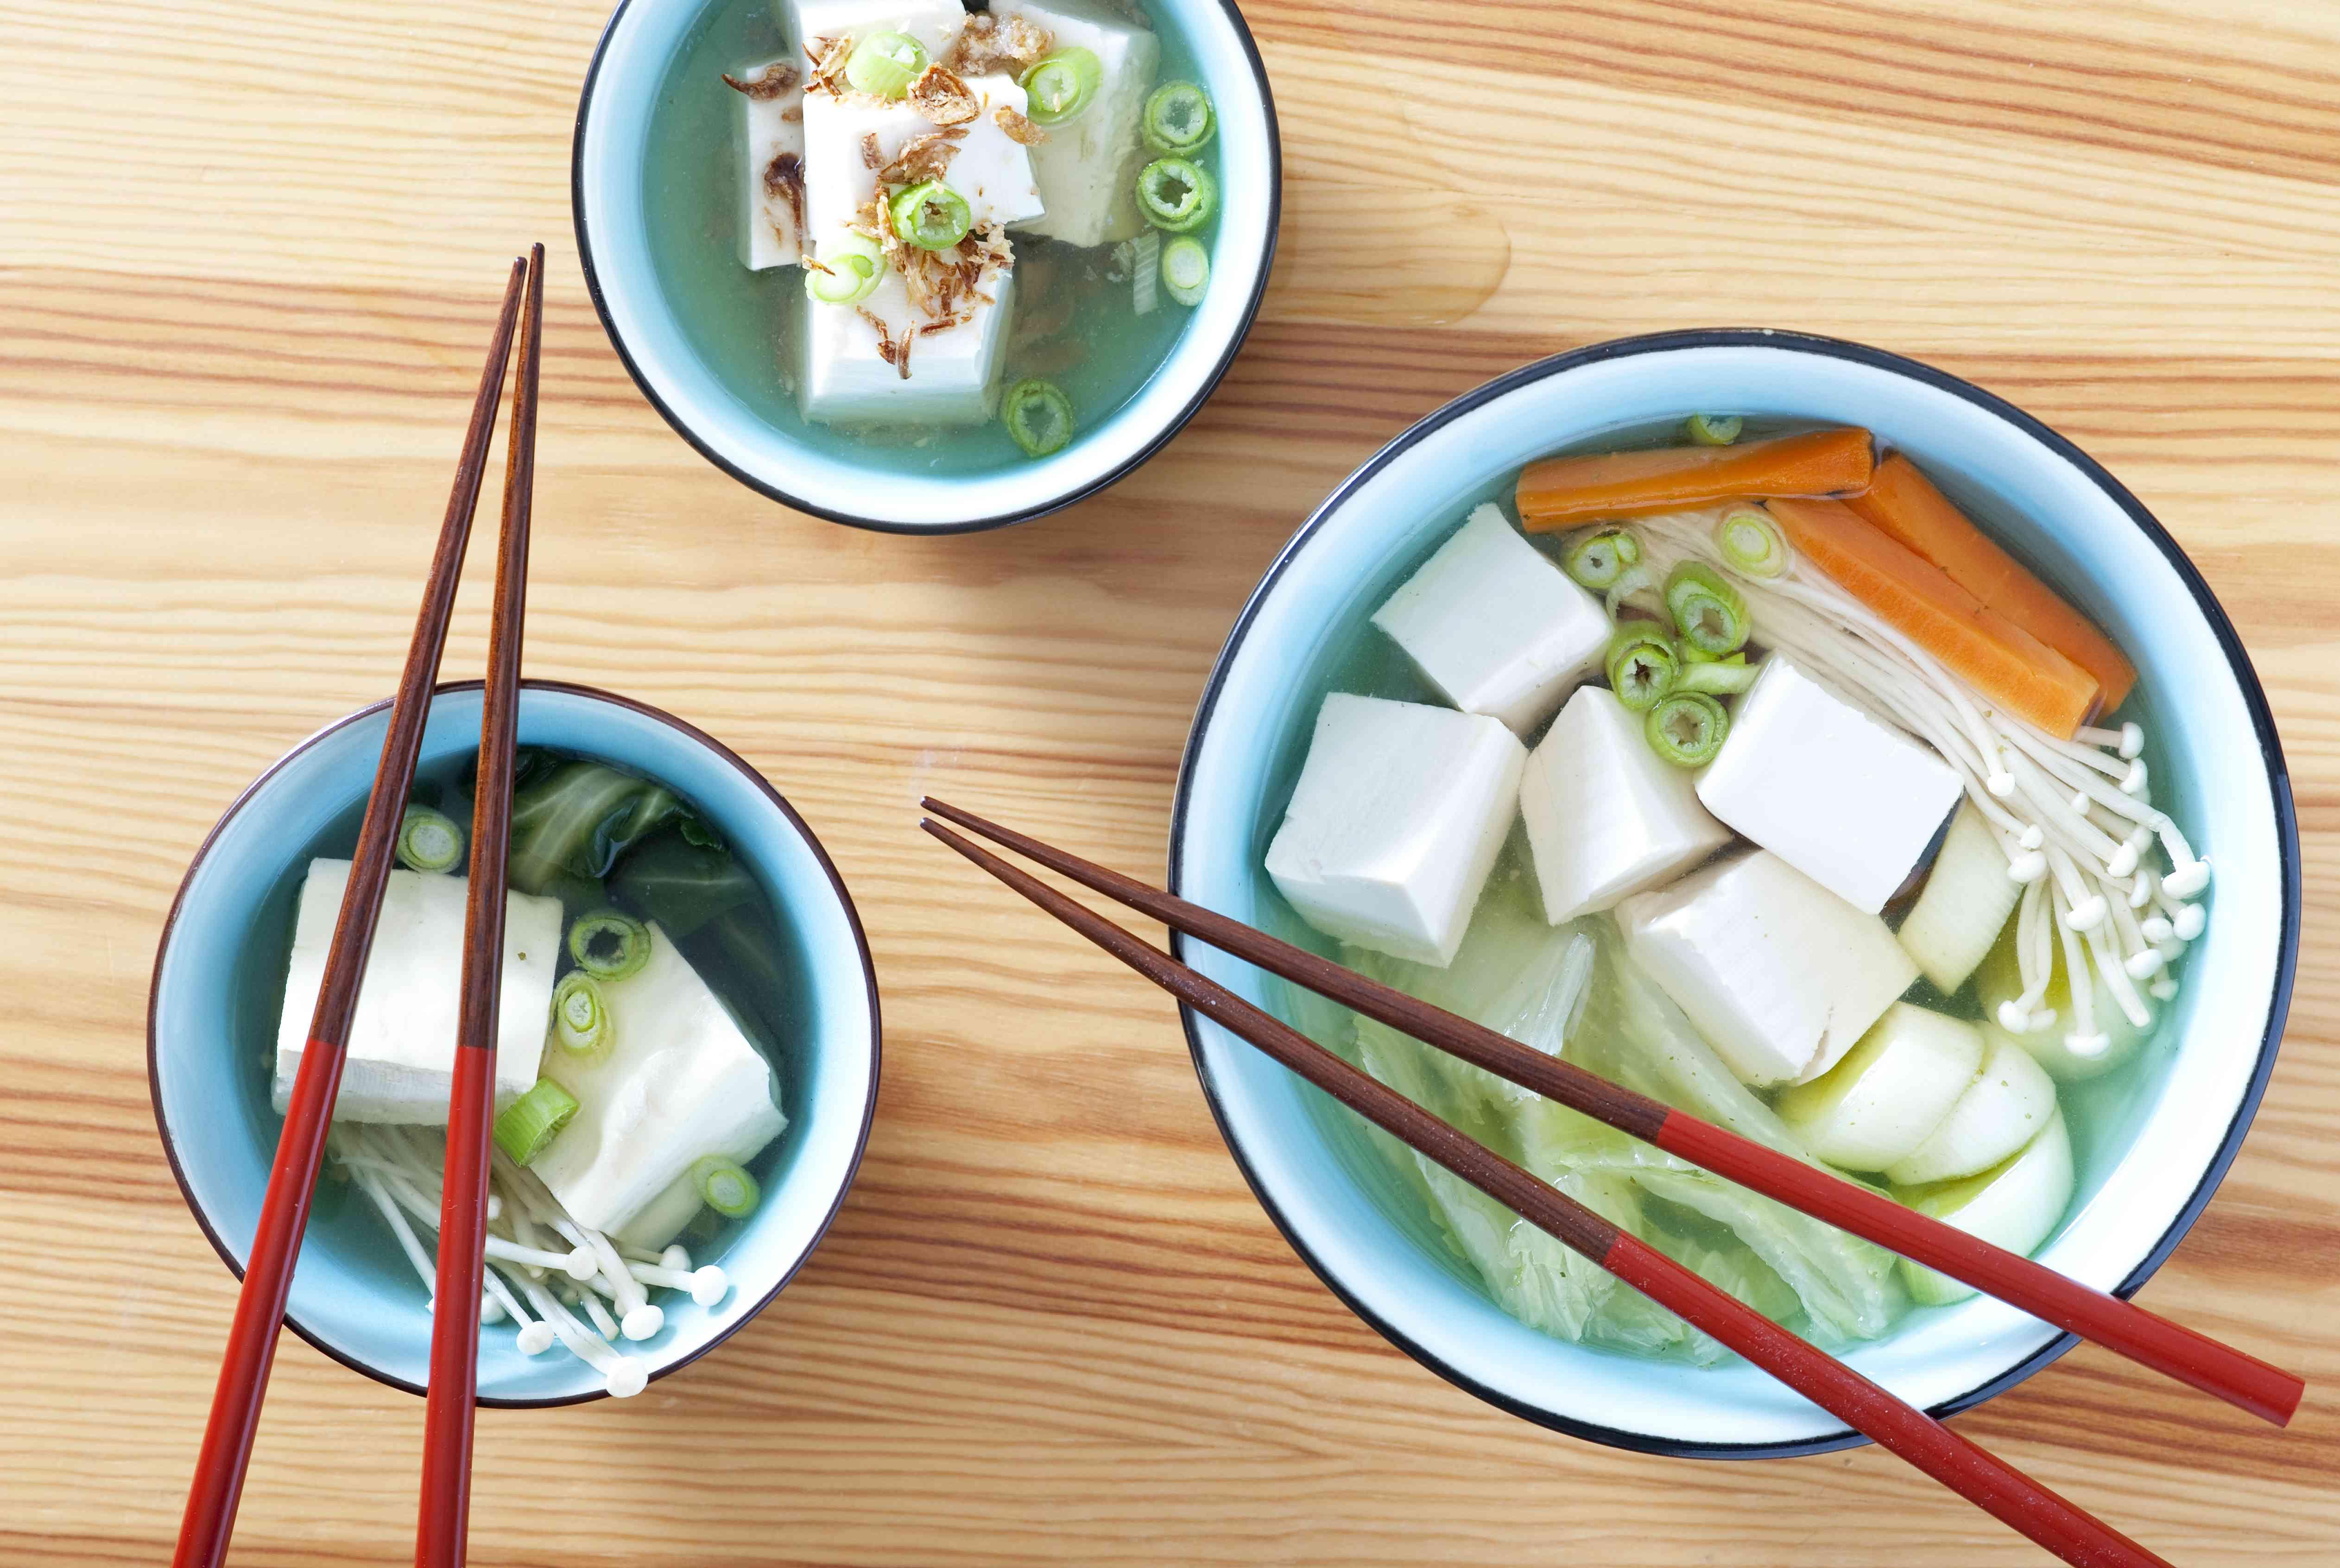 Japanese yudofu stews made of tofu and vegetables (napa cabbage, onions, carrots and mushrooms)